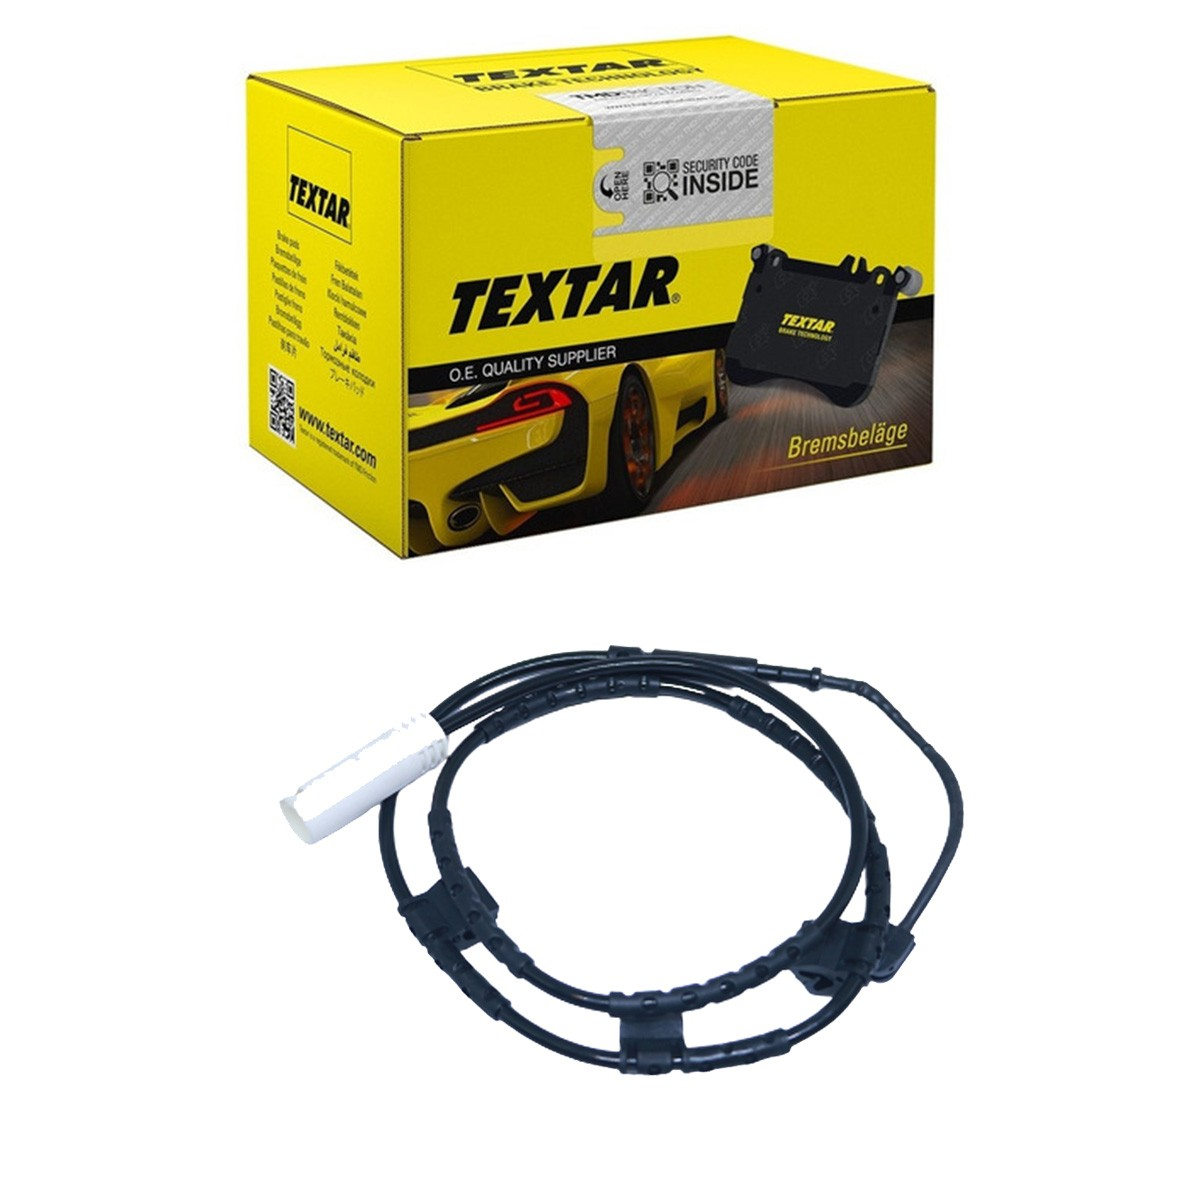 Sensor Pastilha Freio Traseiro Mini Cabriolet 2007 A 2015 / Mini Clubman 2006 A 2014 / Mini Coupe 2010 A 2015 / Mini Esportivo 2005 A 2013 / Mini Roadster 2011 A 2015 98044900